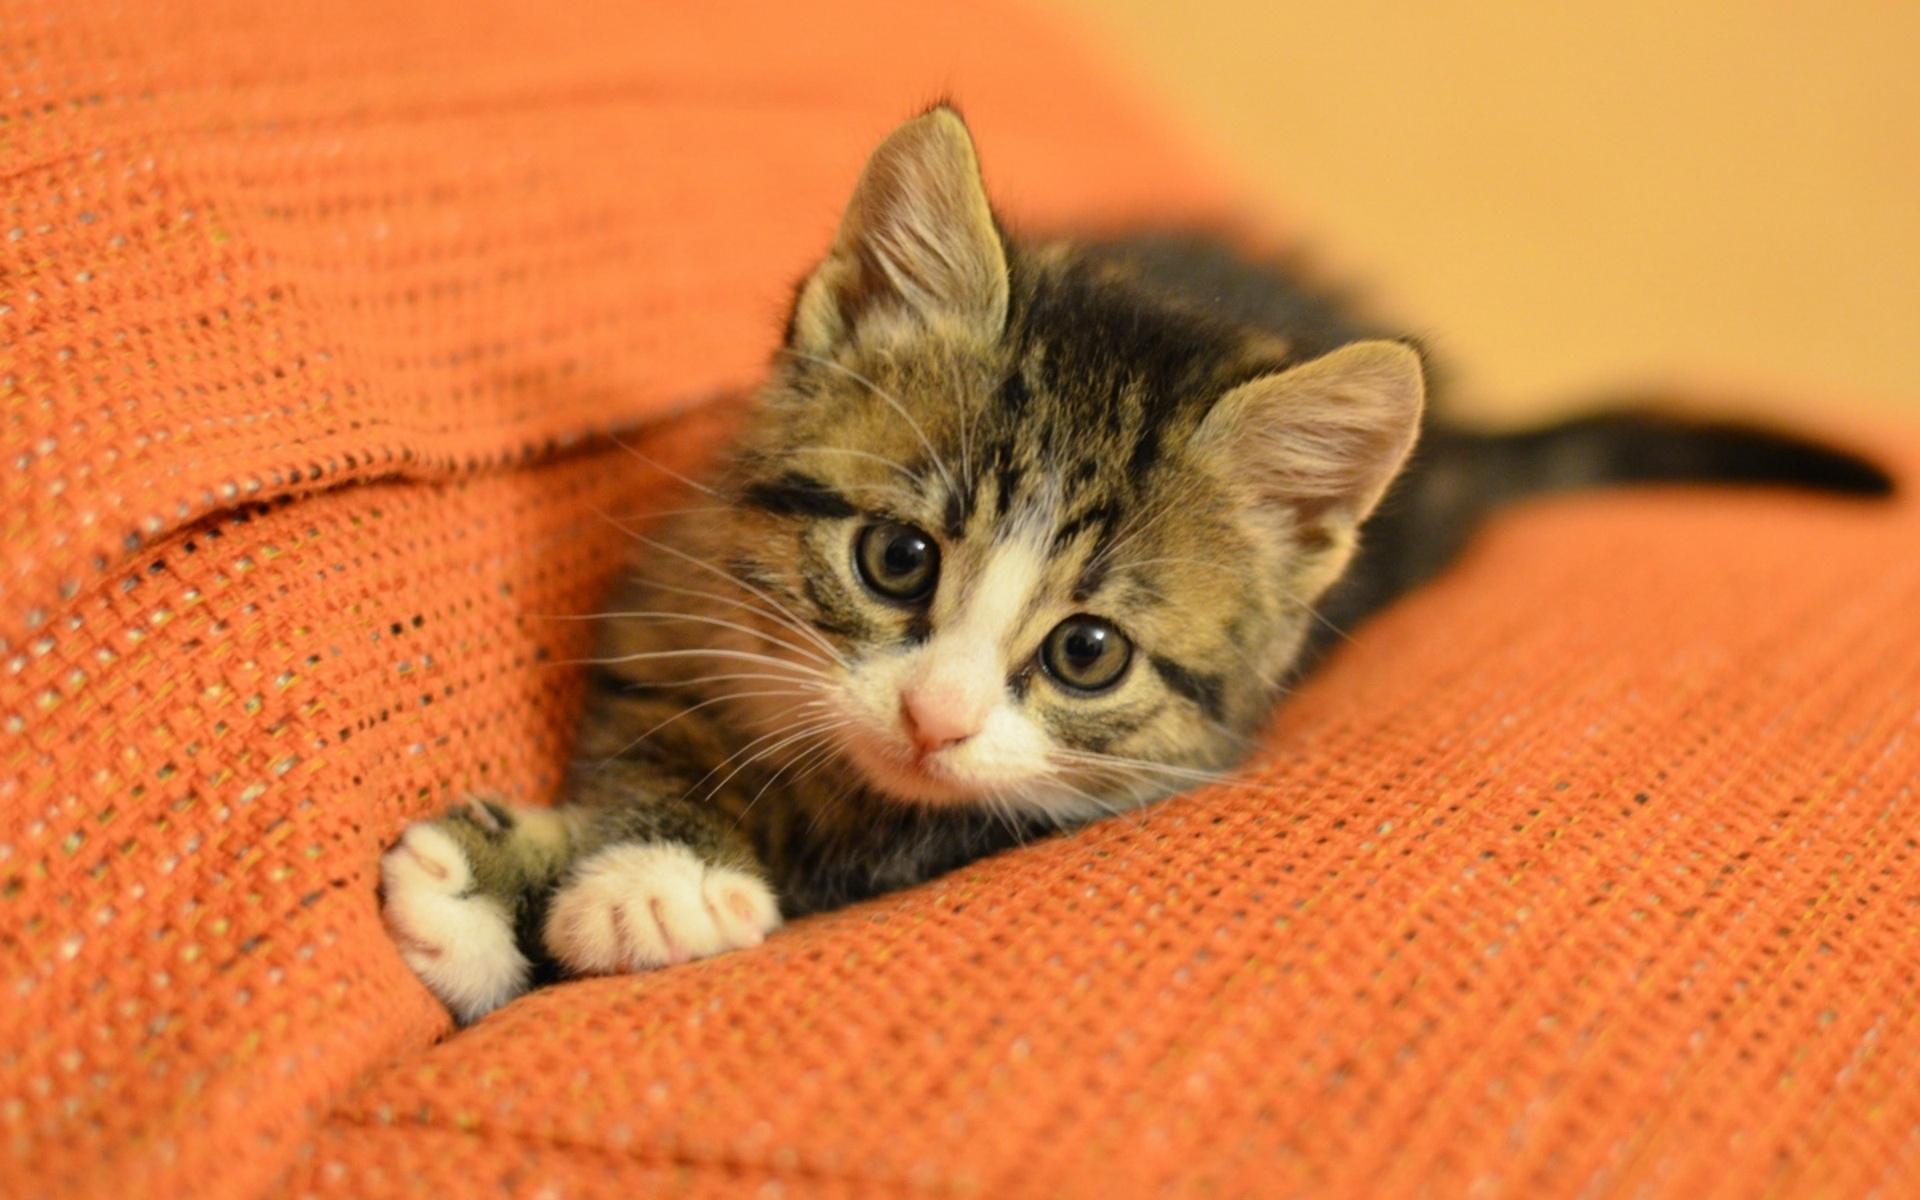 download wallpaper: kitten op de bank wallpaper